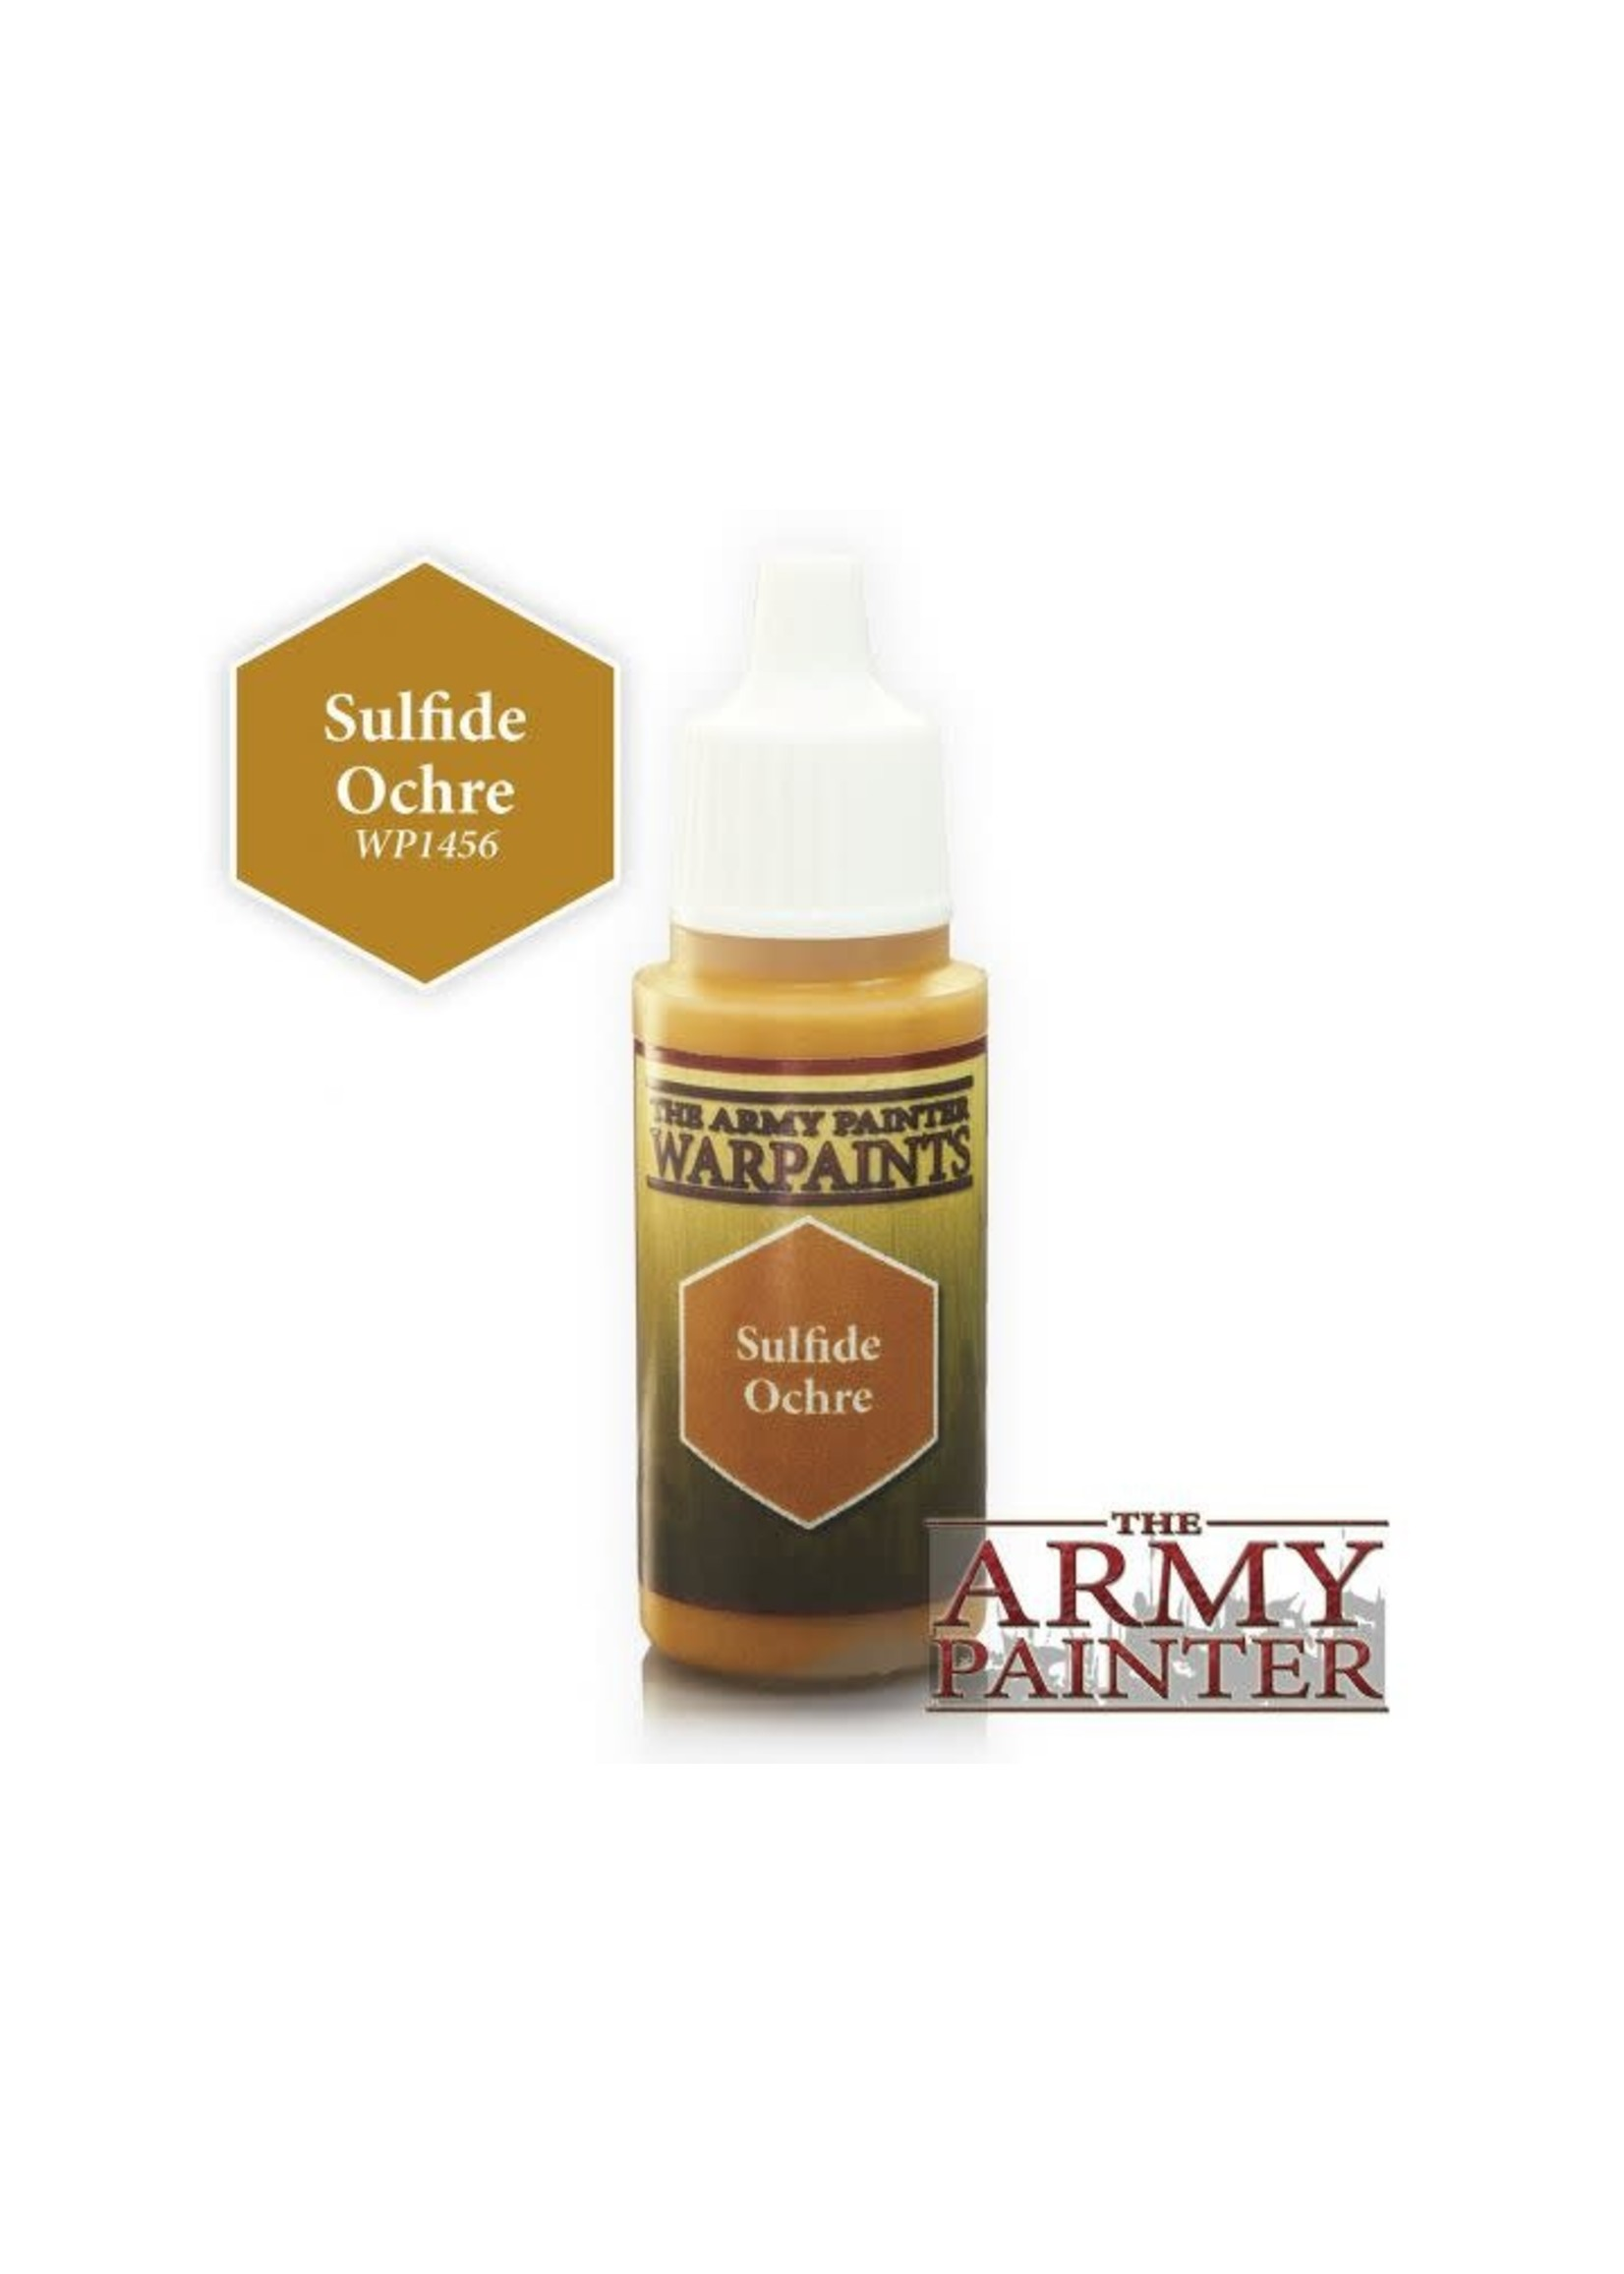 Army Painter Warpaints - Sulfide Ochre